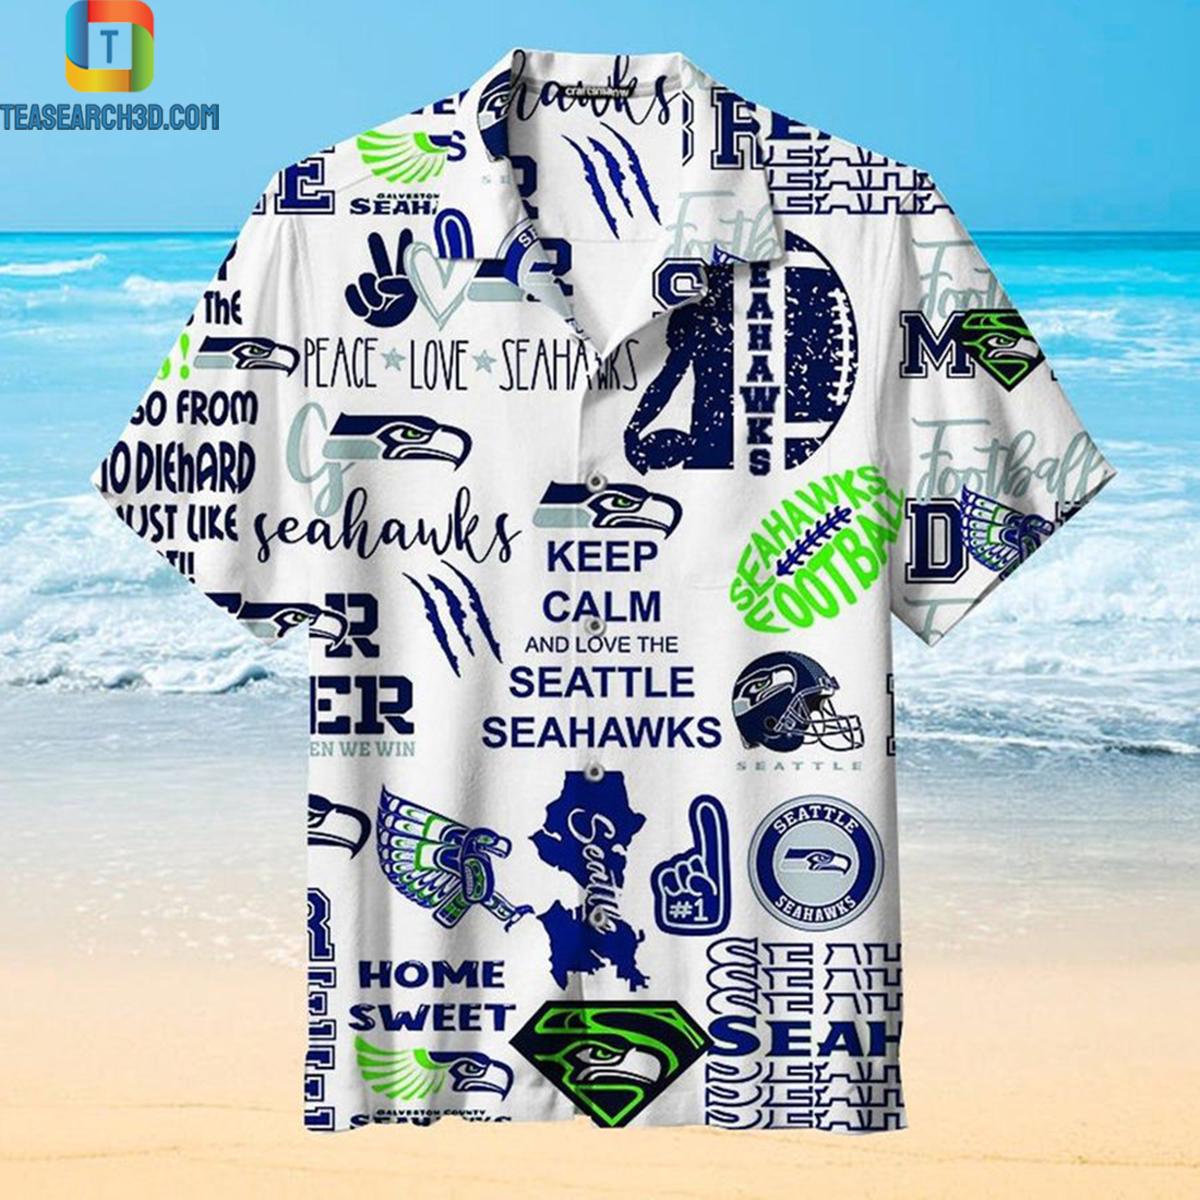 Keep calm and and love the Seattle Seahawks hawaiian shirt 2